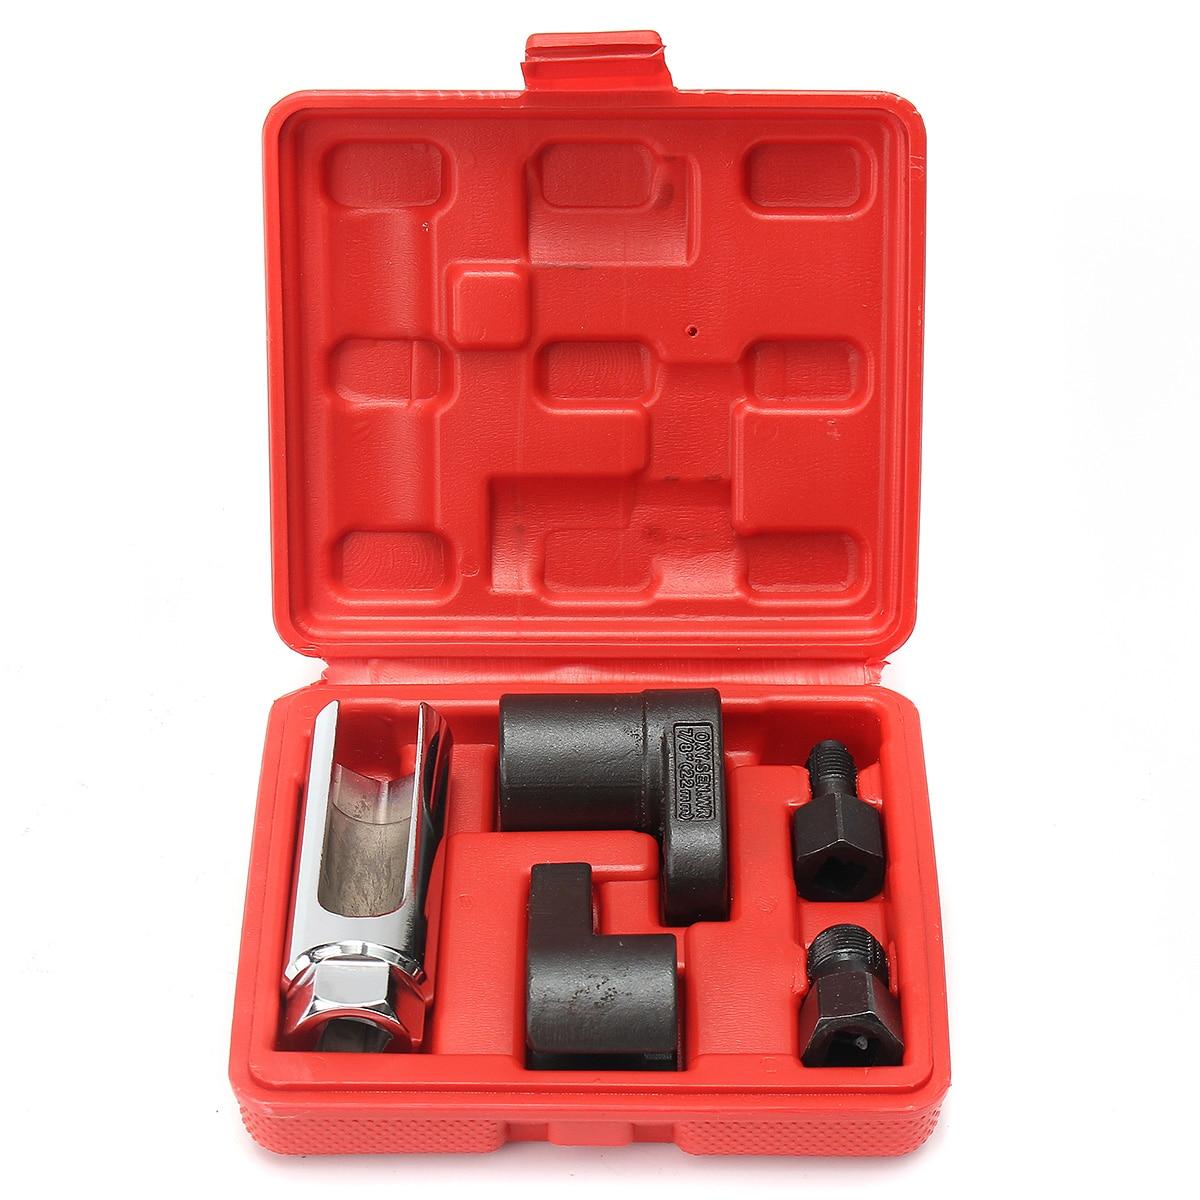 Oxygen O2 Sensor 234-4835 Downstream 2 Rear For Nissan Titan 5.6L 2004-2014 US